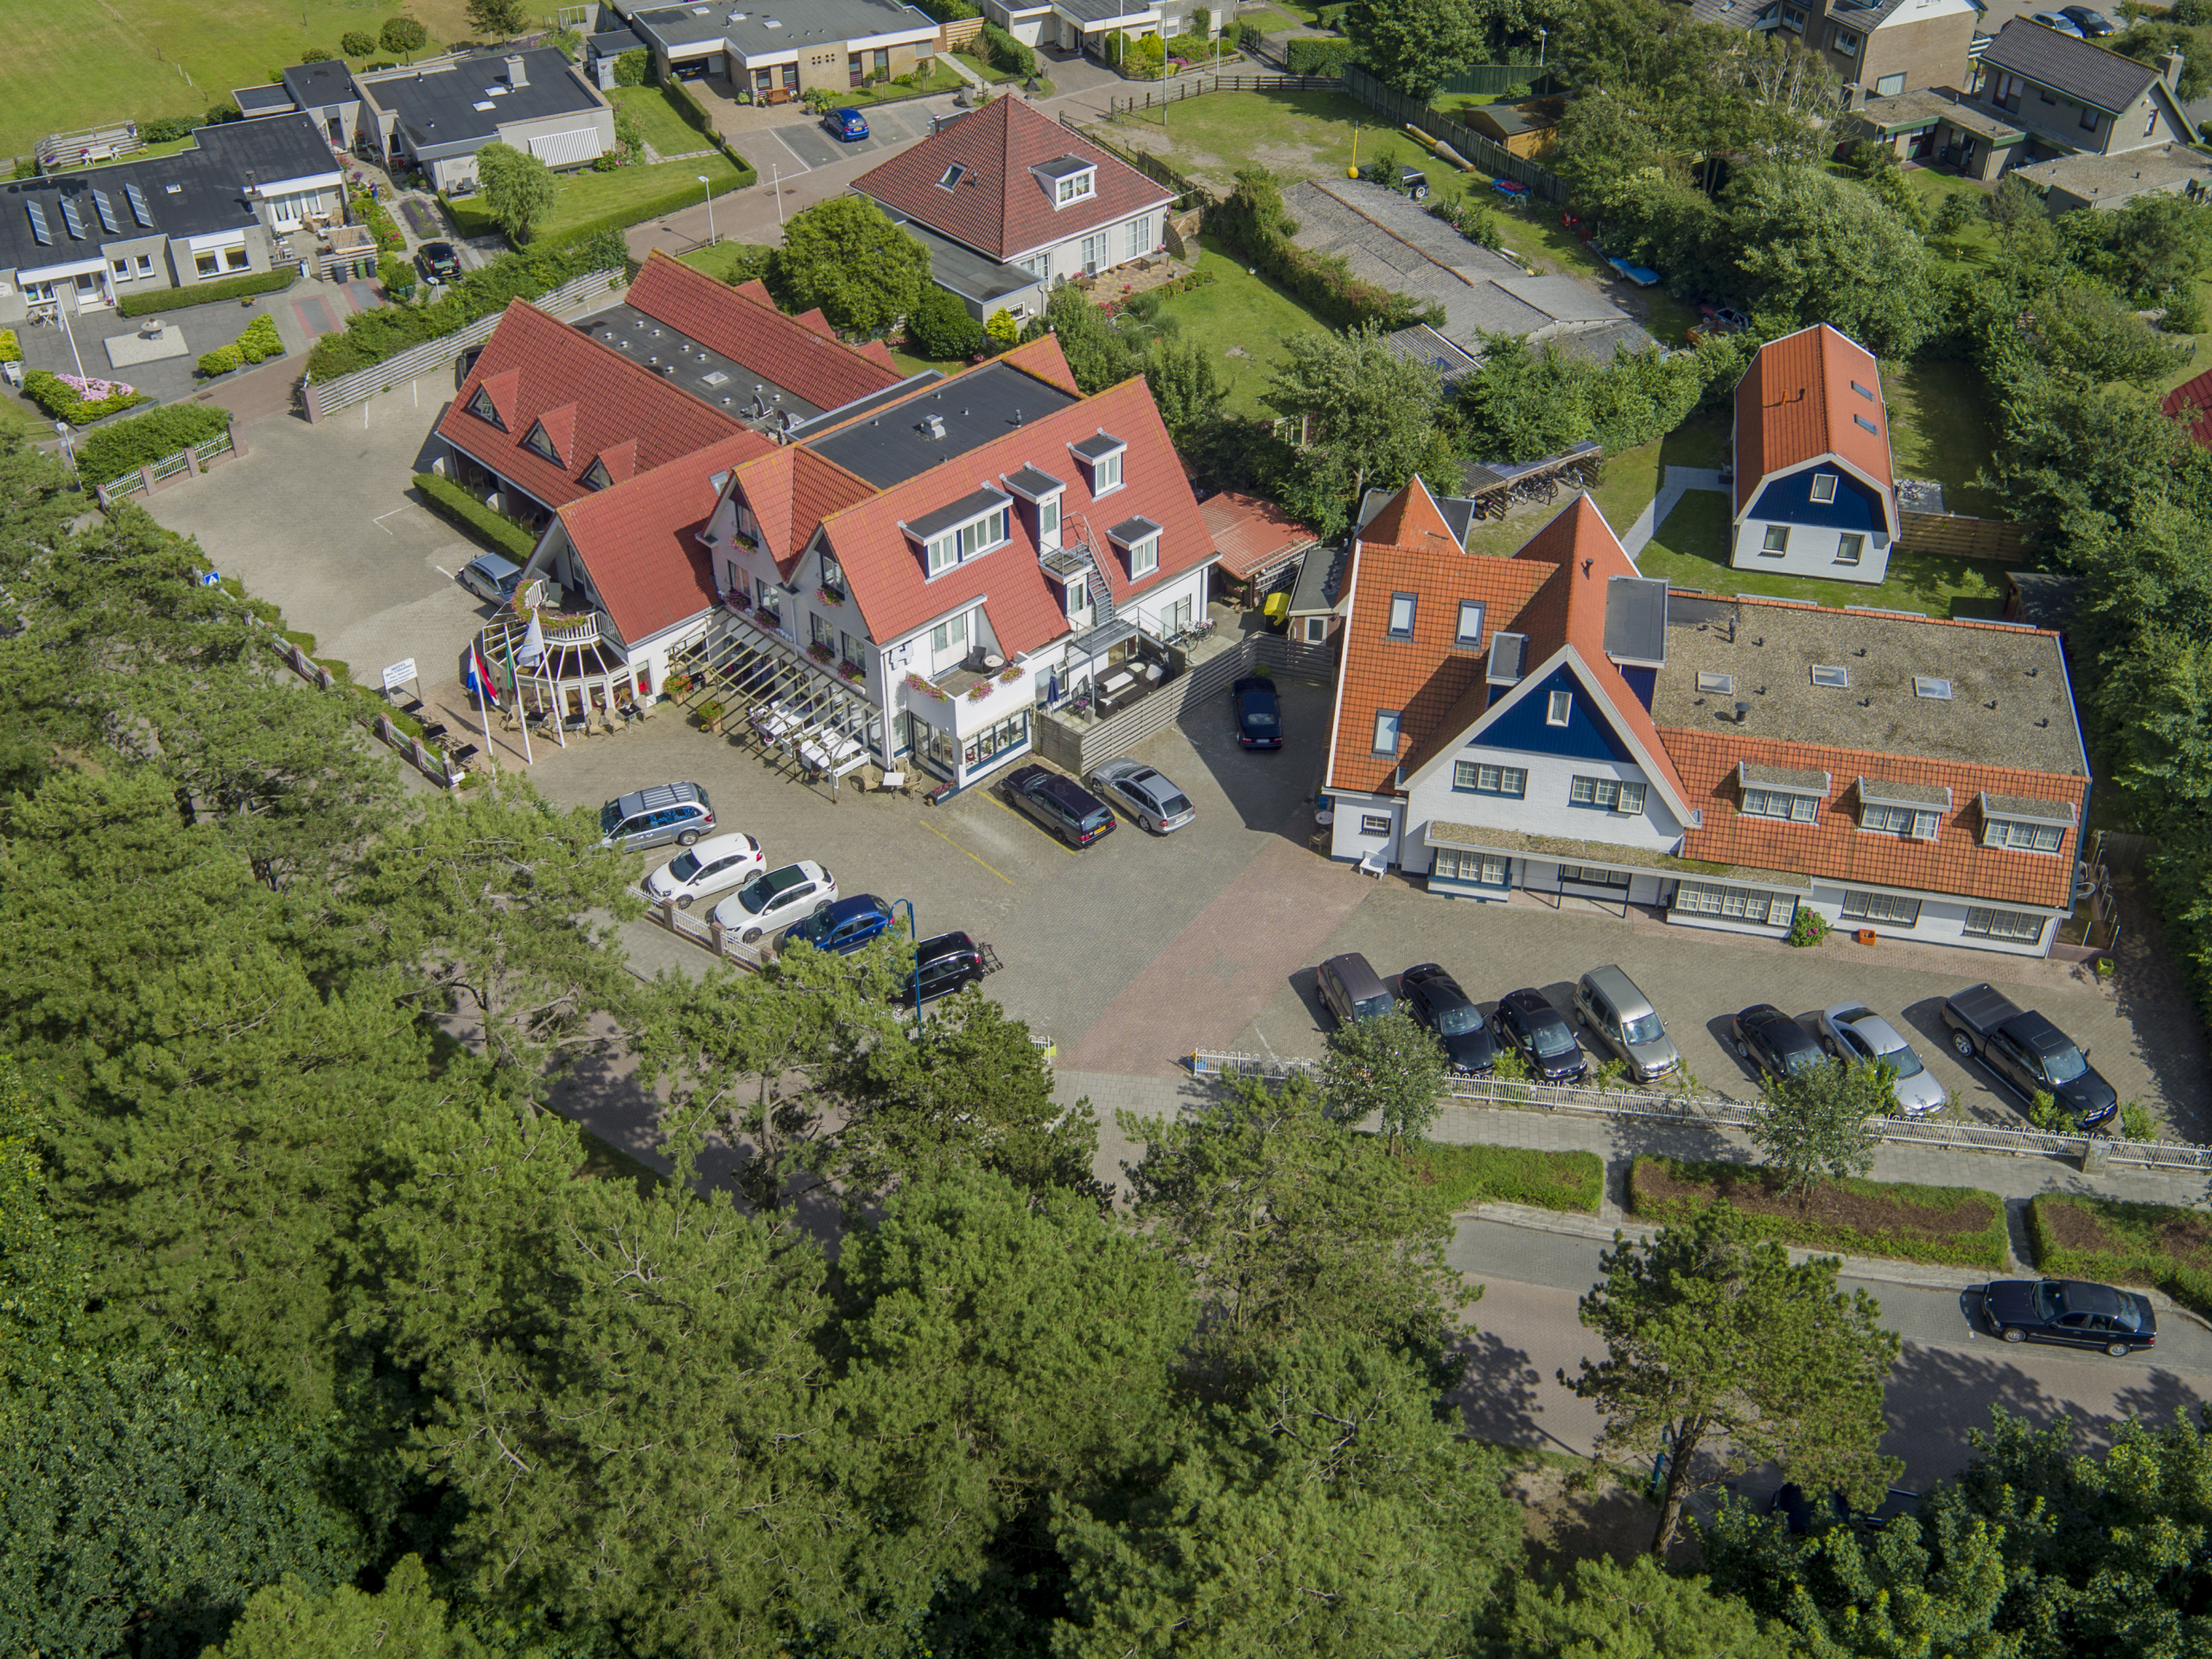 Angenehmes Familienhotel am Rande des Badplatzes De Koog